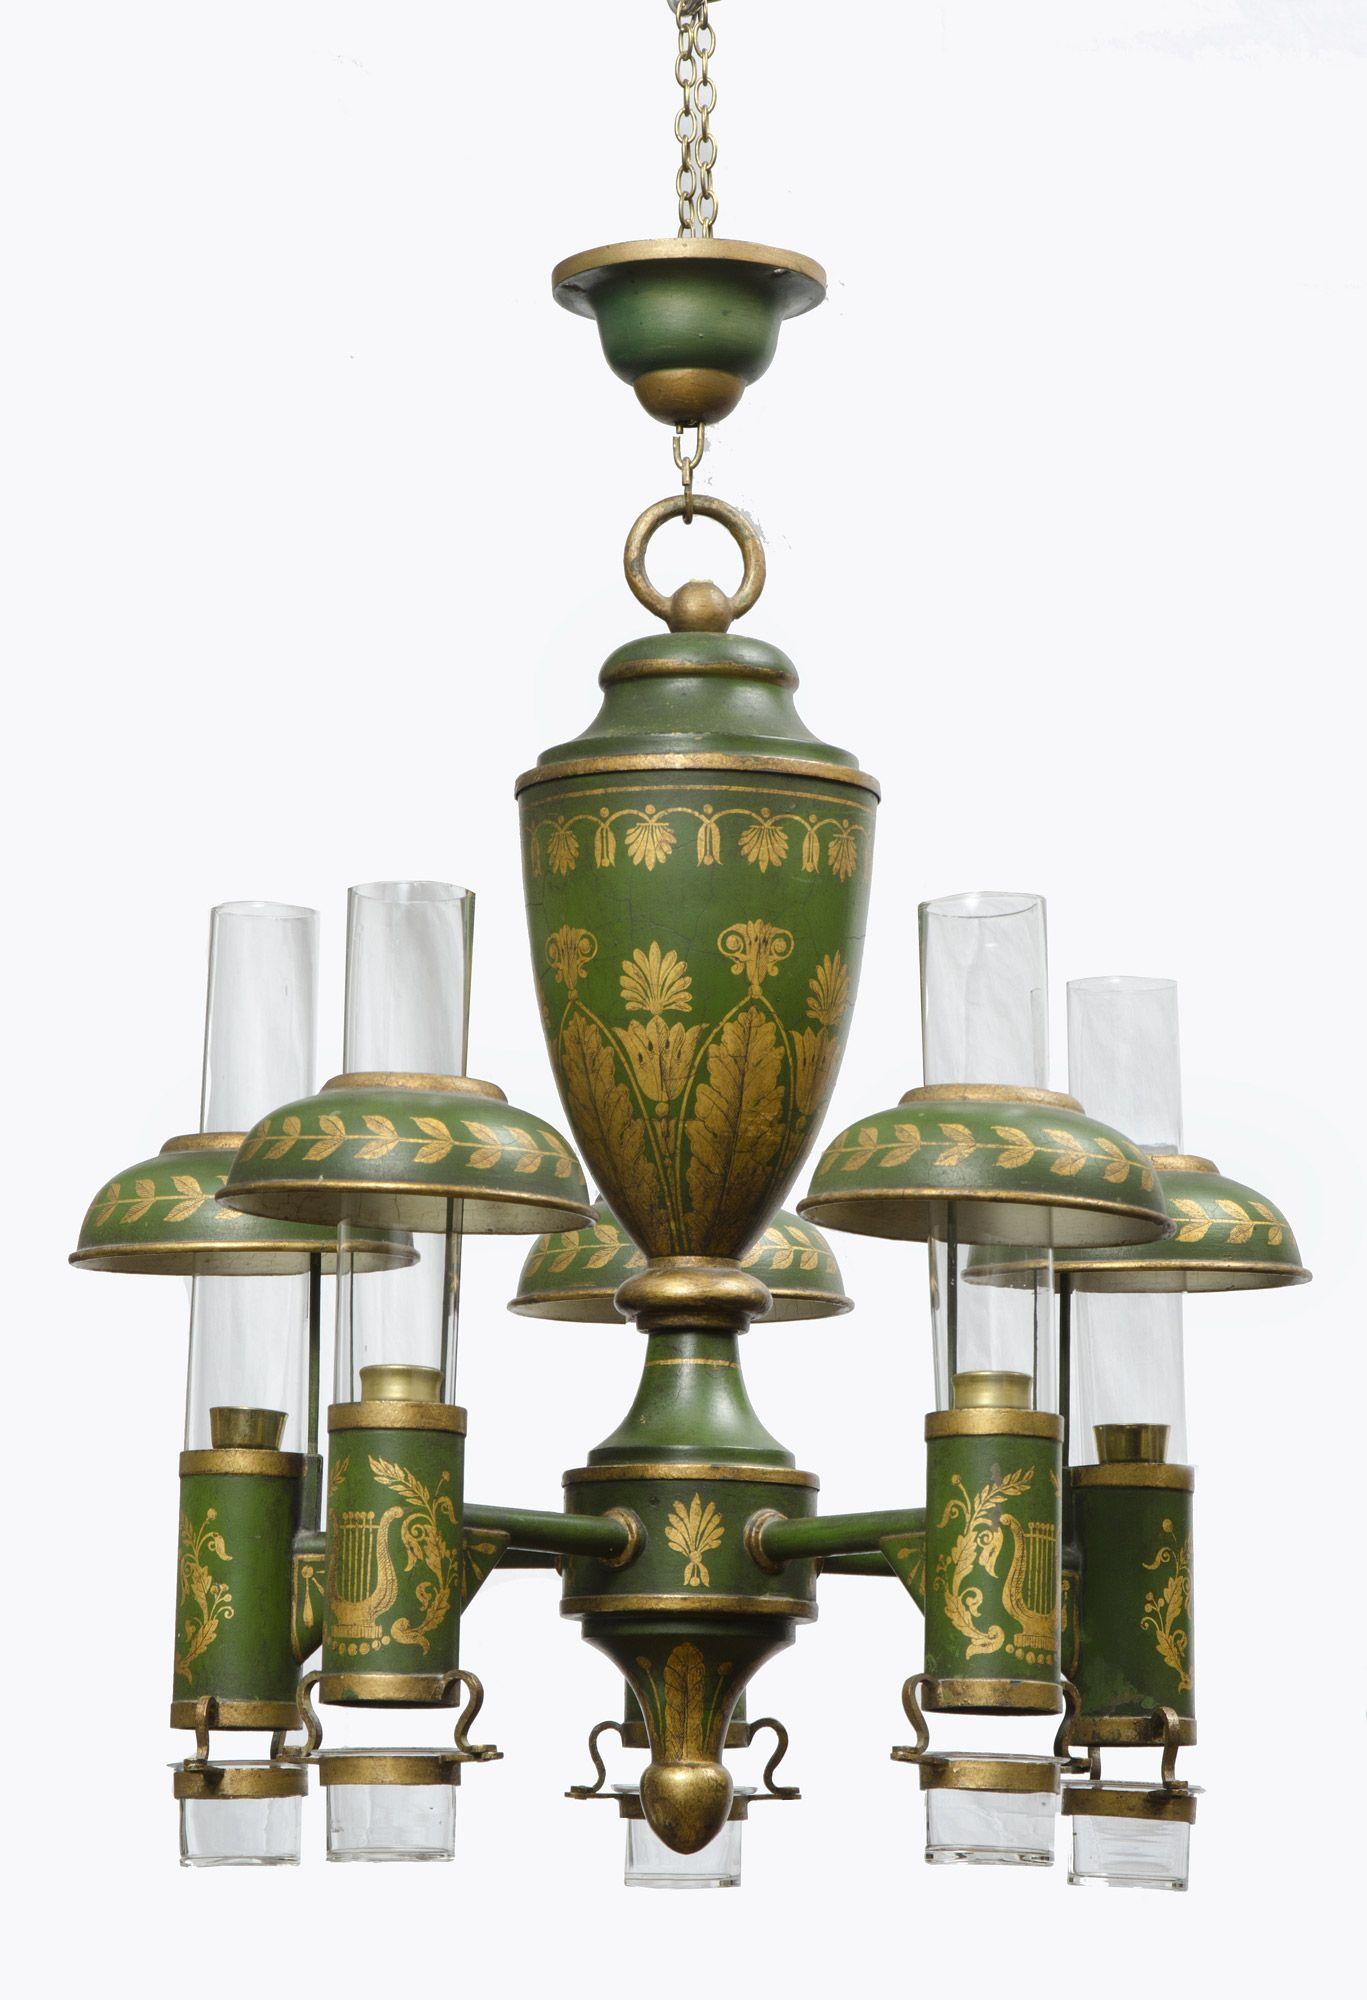 French antique tole peinte chandelier tootolely mad for toleware french antique tole peinte chandelier arubaitofo Image collections